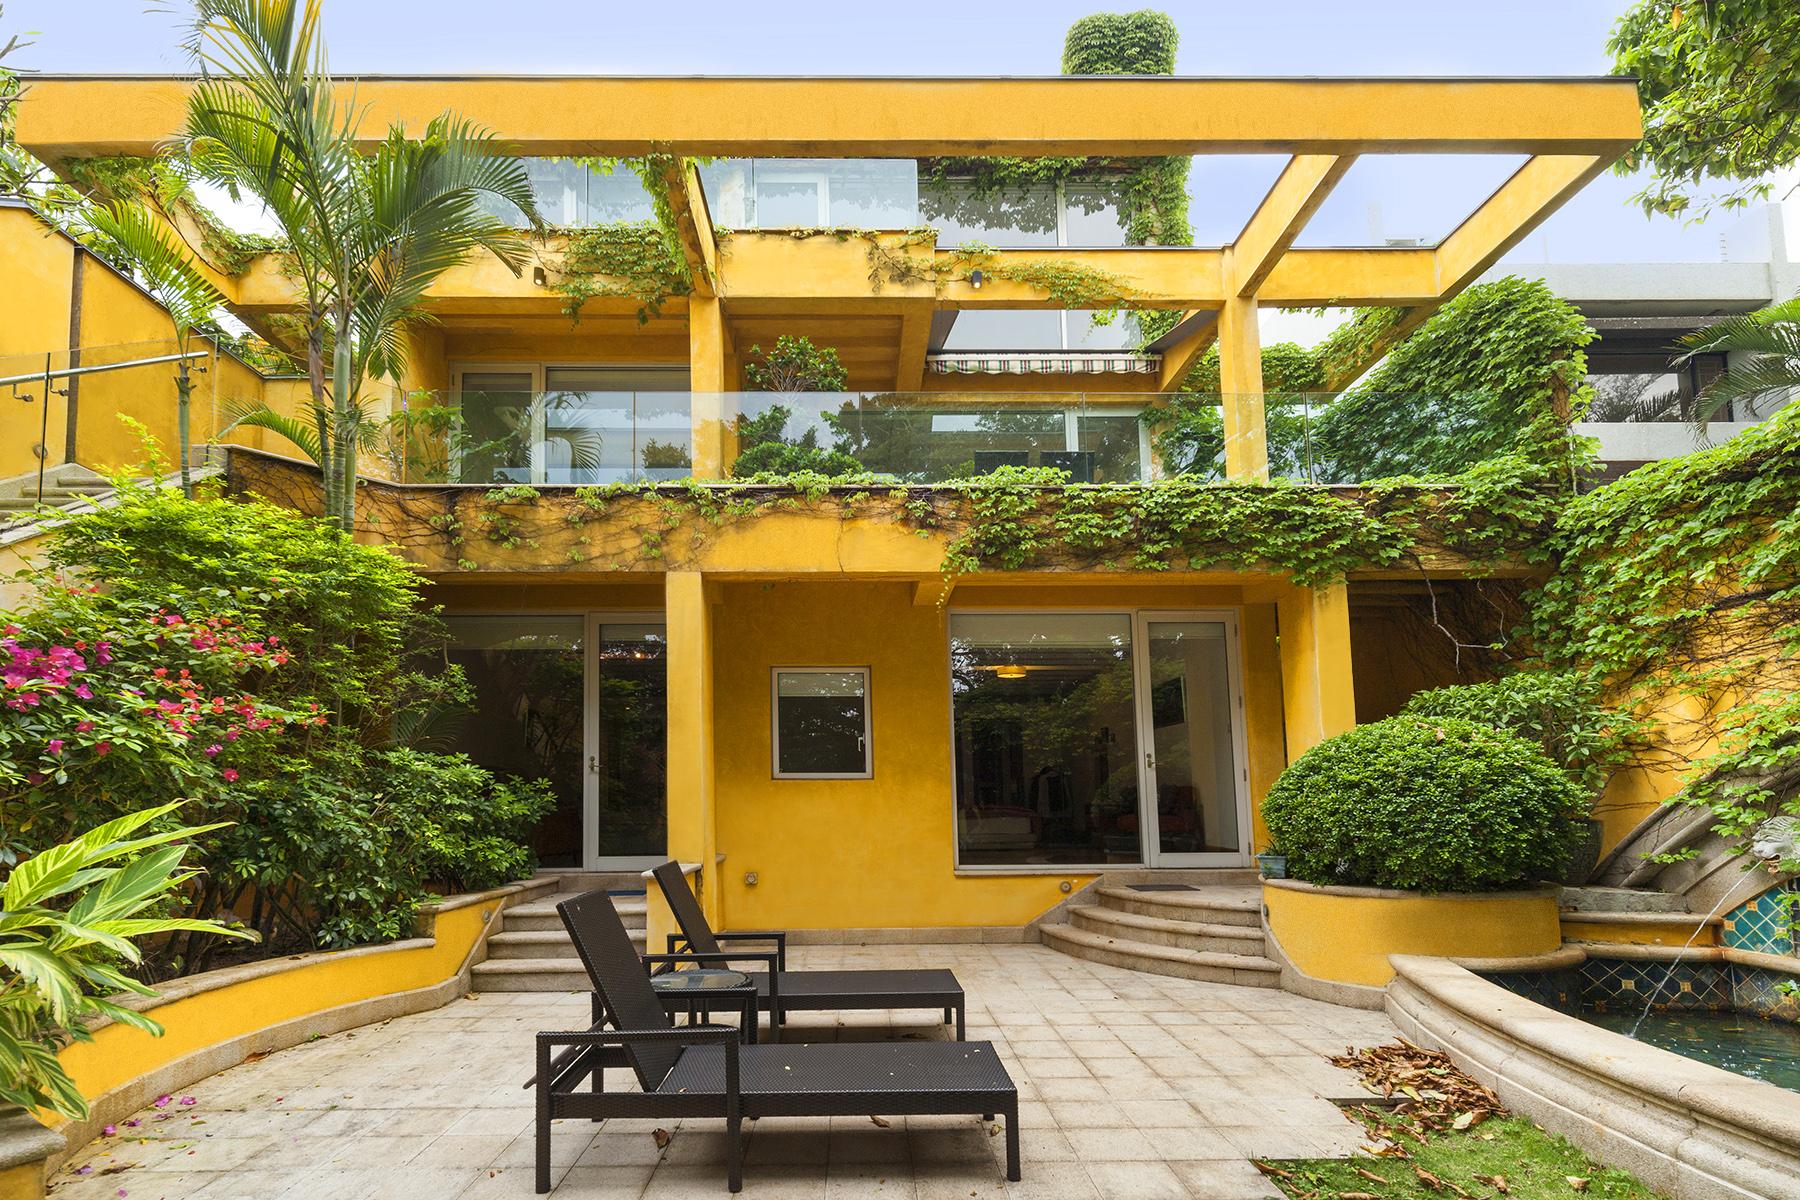 Single Family Home for Sale at Carmelia Stanley, Hong Kong Hong Kong